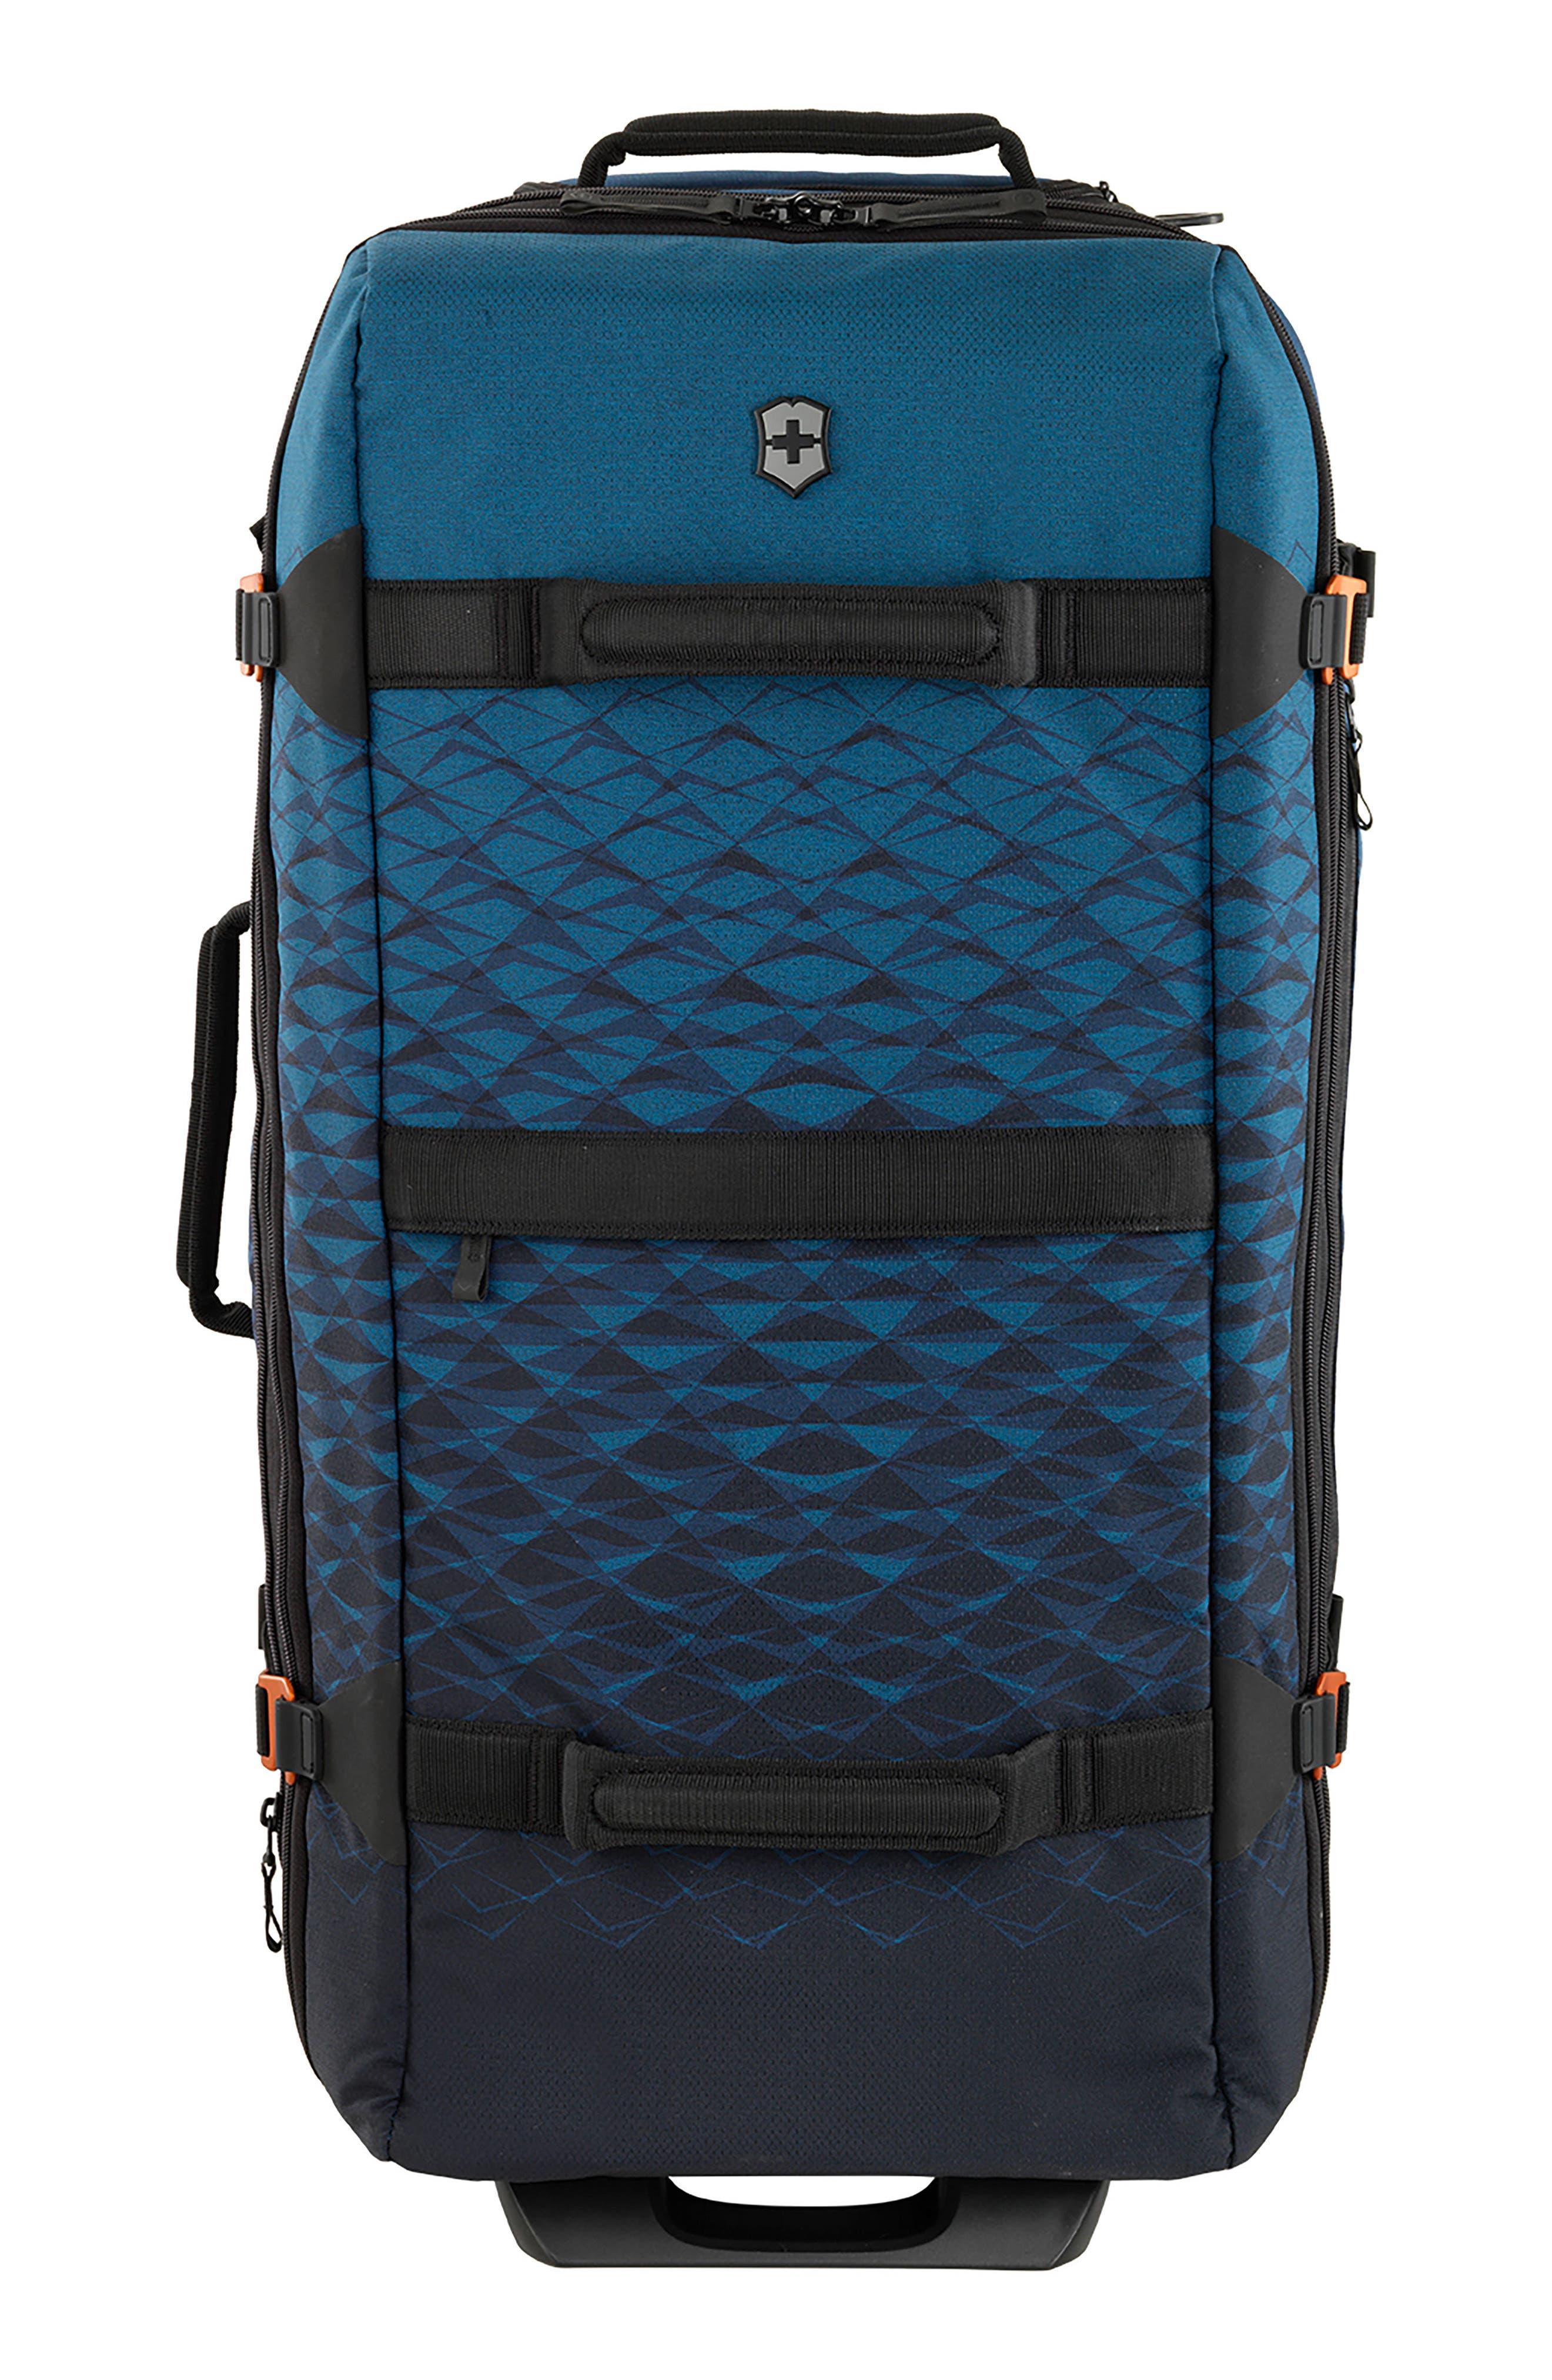 VX Touring Large Wheeled Duffel Bag,                             Main thumbnail 1, color,                             Dark Teal